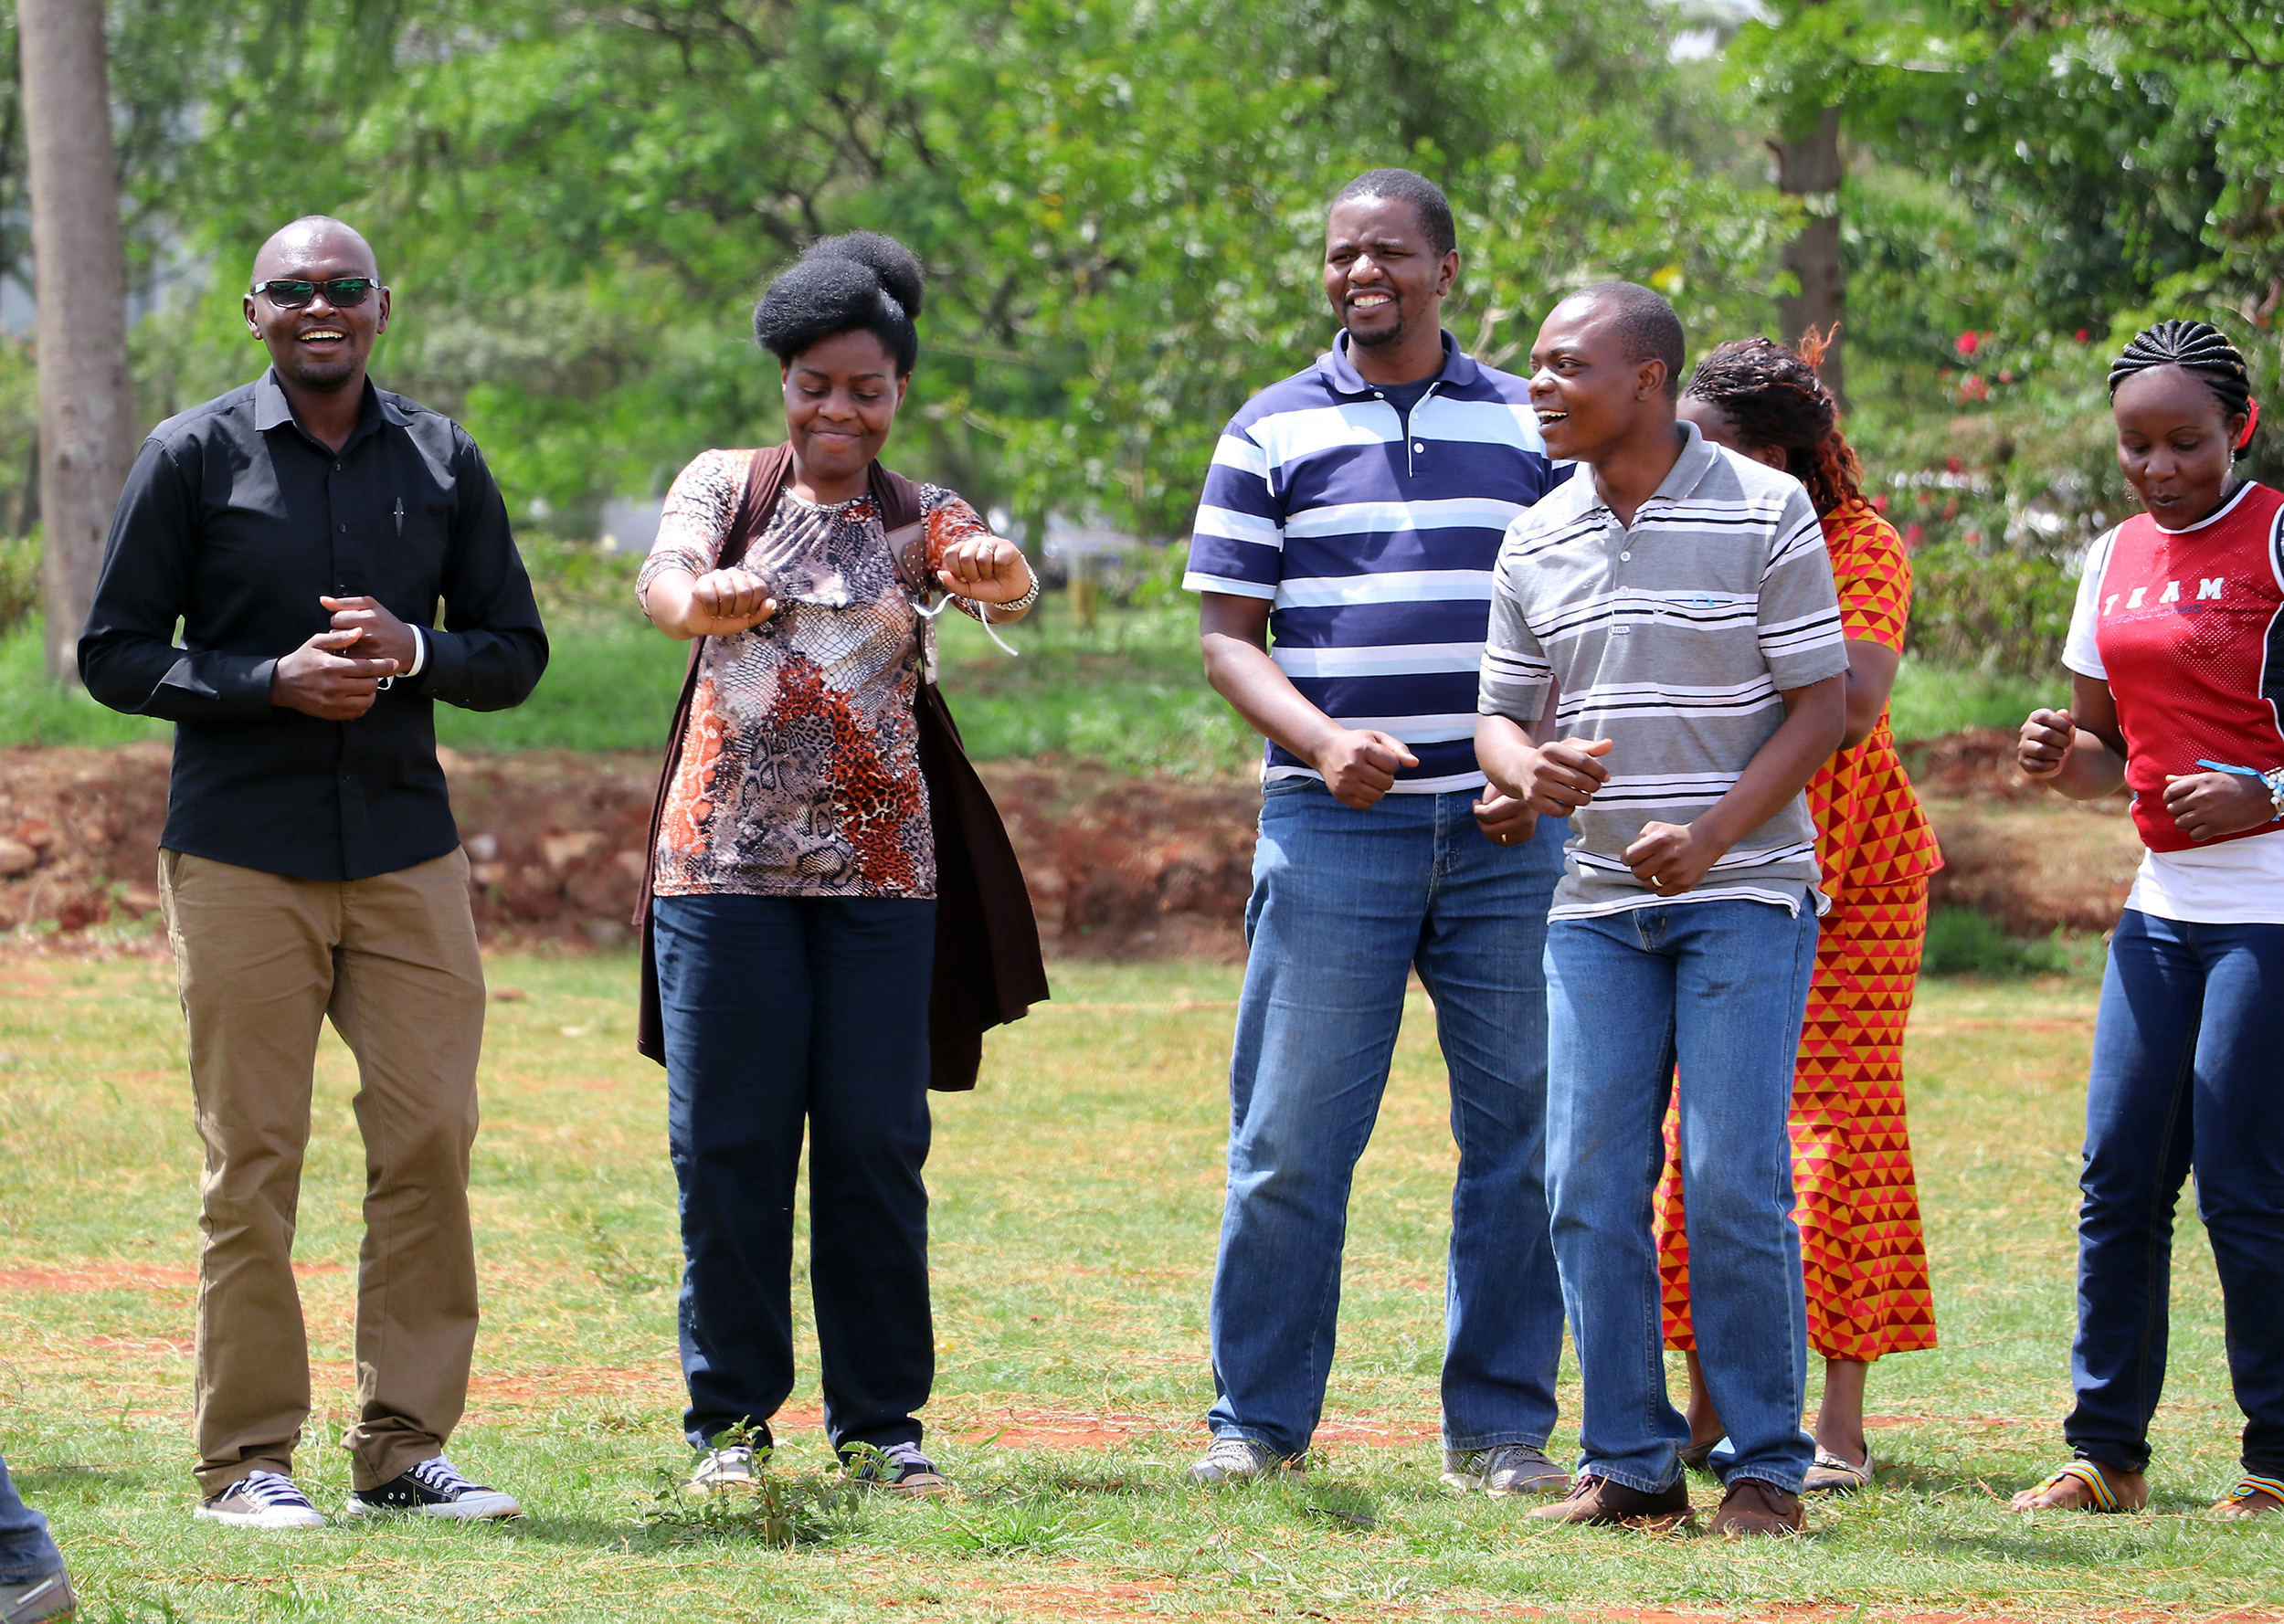 Team - Missions of Hope International